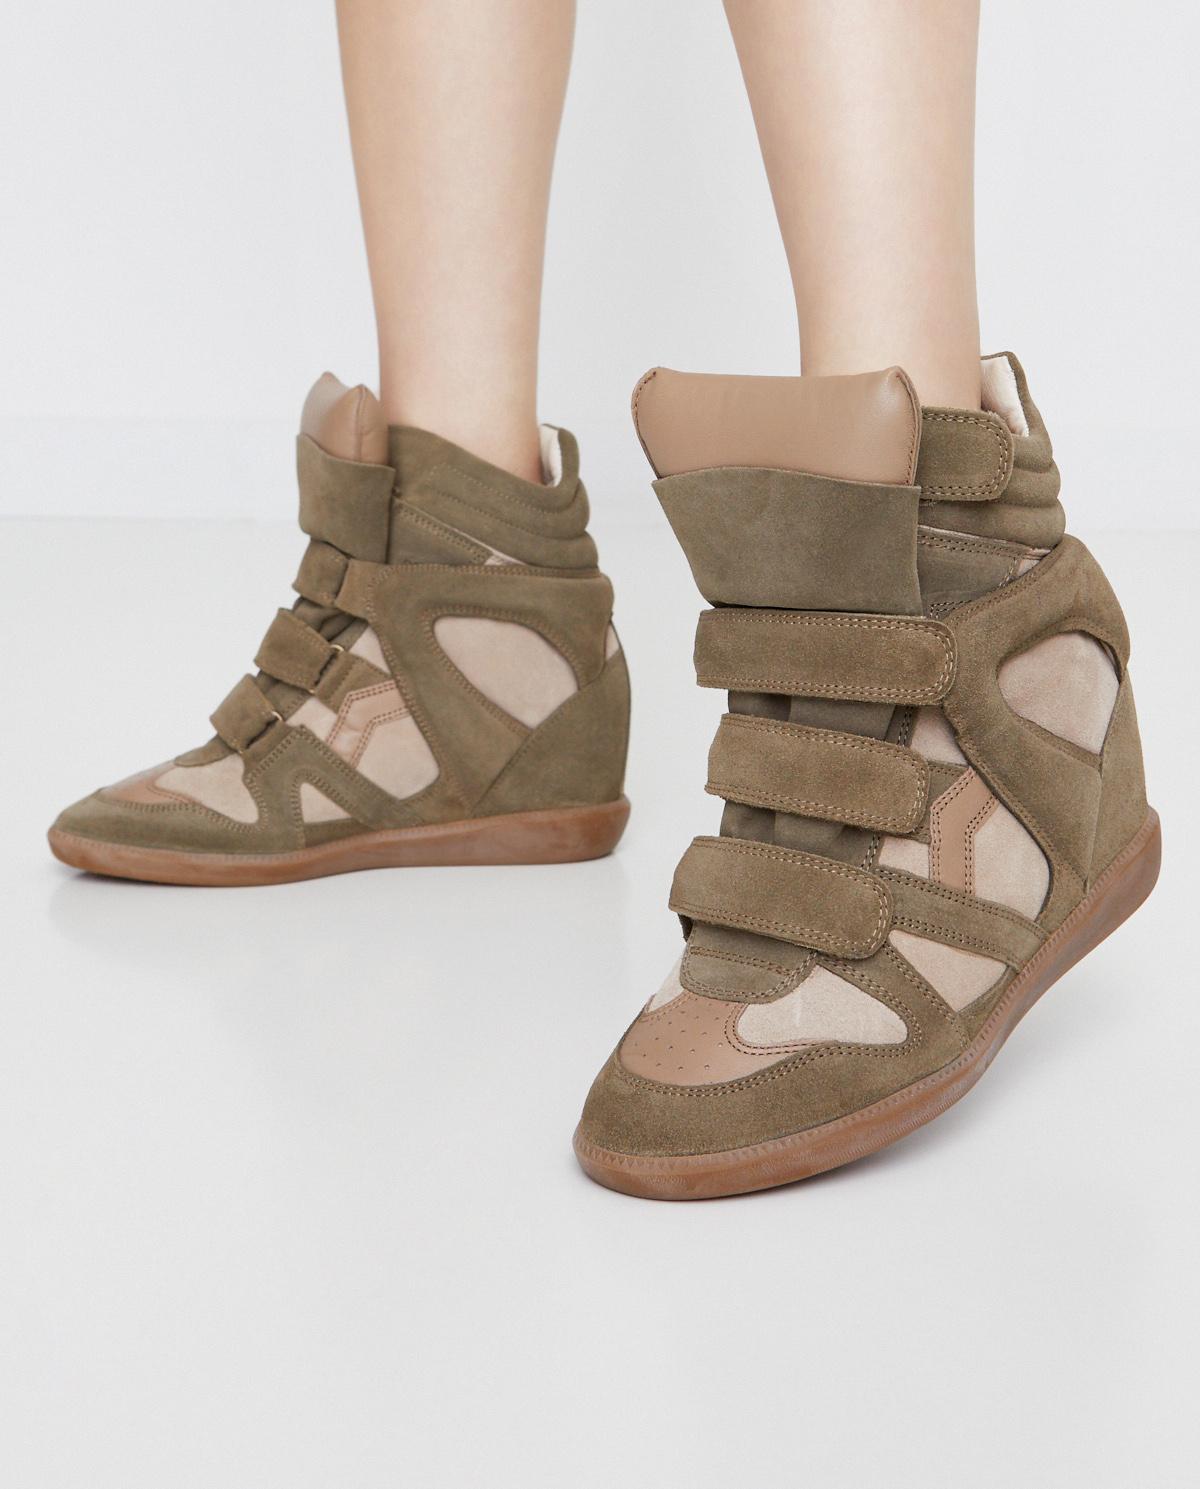 Sneakersy Bekett Taupe Isabel Marant Moliera2 Com